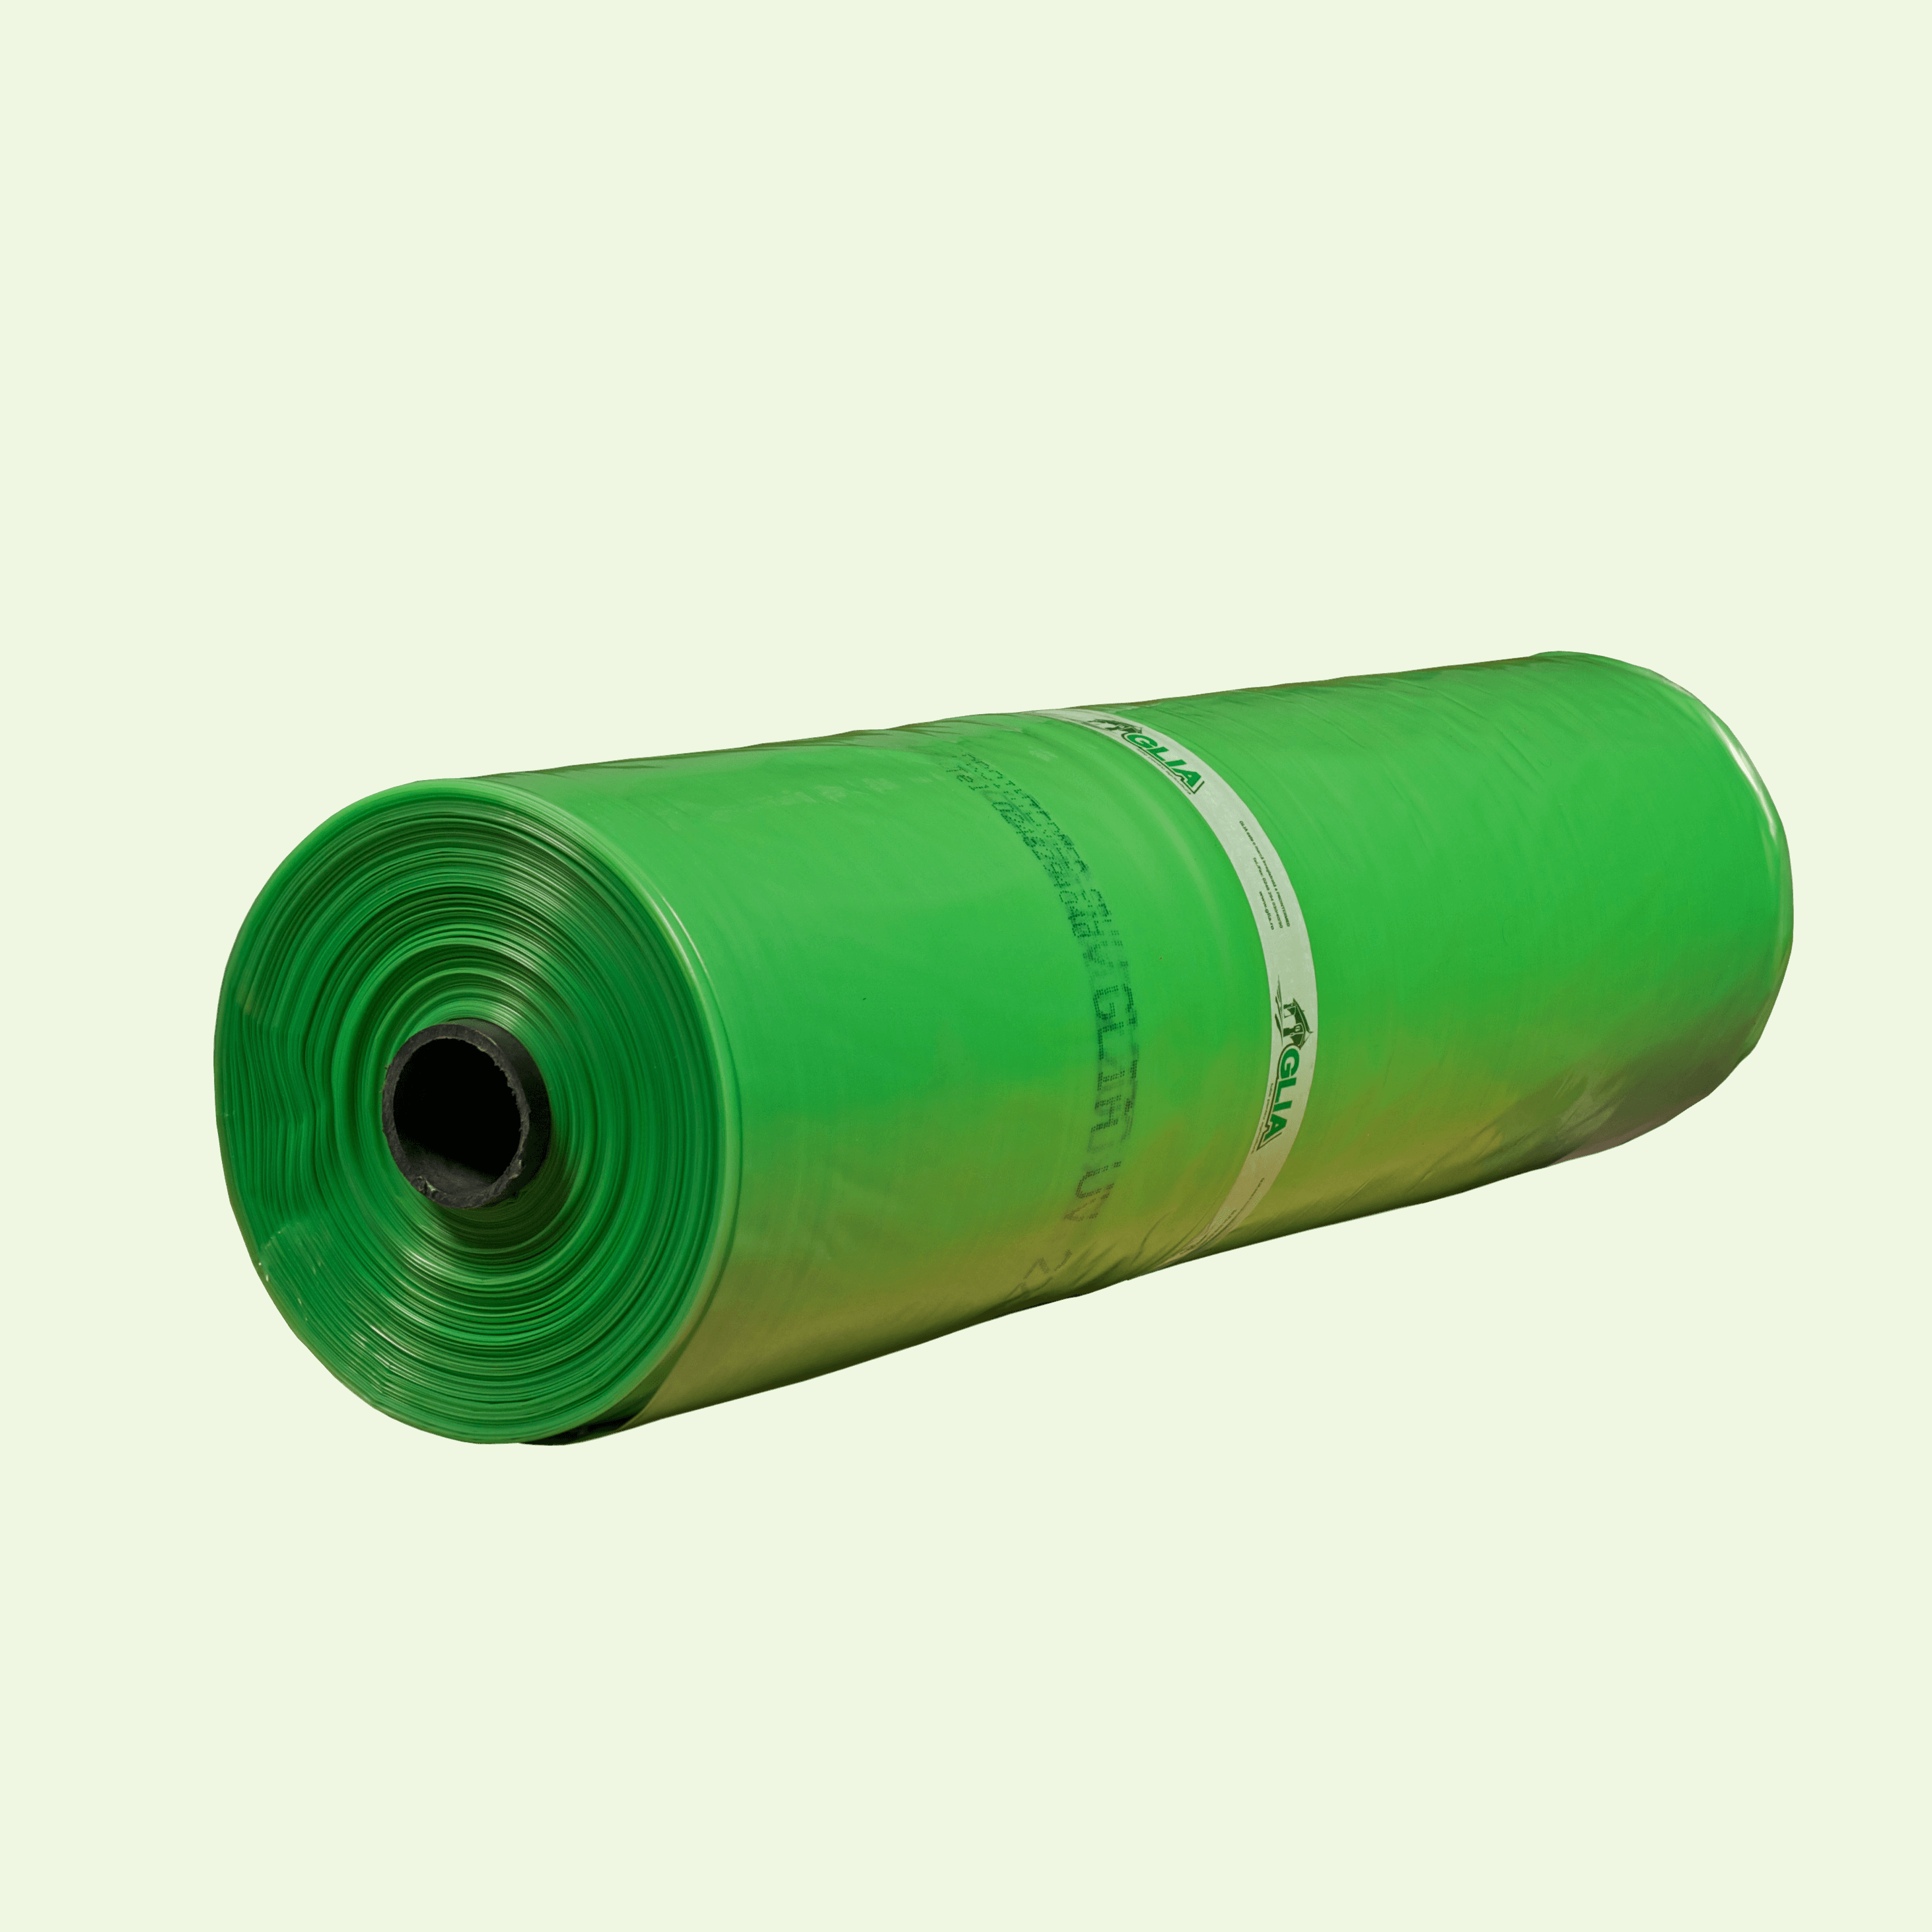 Folie polietilena Glia UV, PE natur verde, 0.15 mm grosime, rezistenta UV 36 luni, 8.20 m latime mathaus 2021